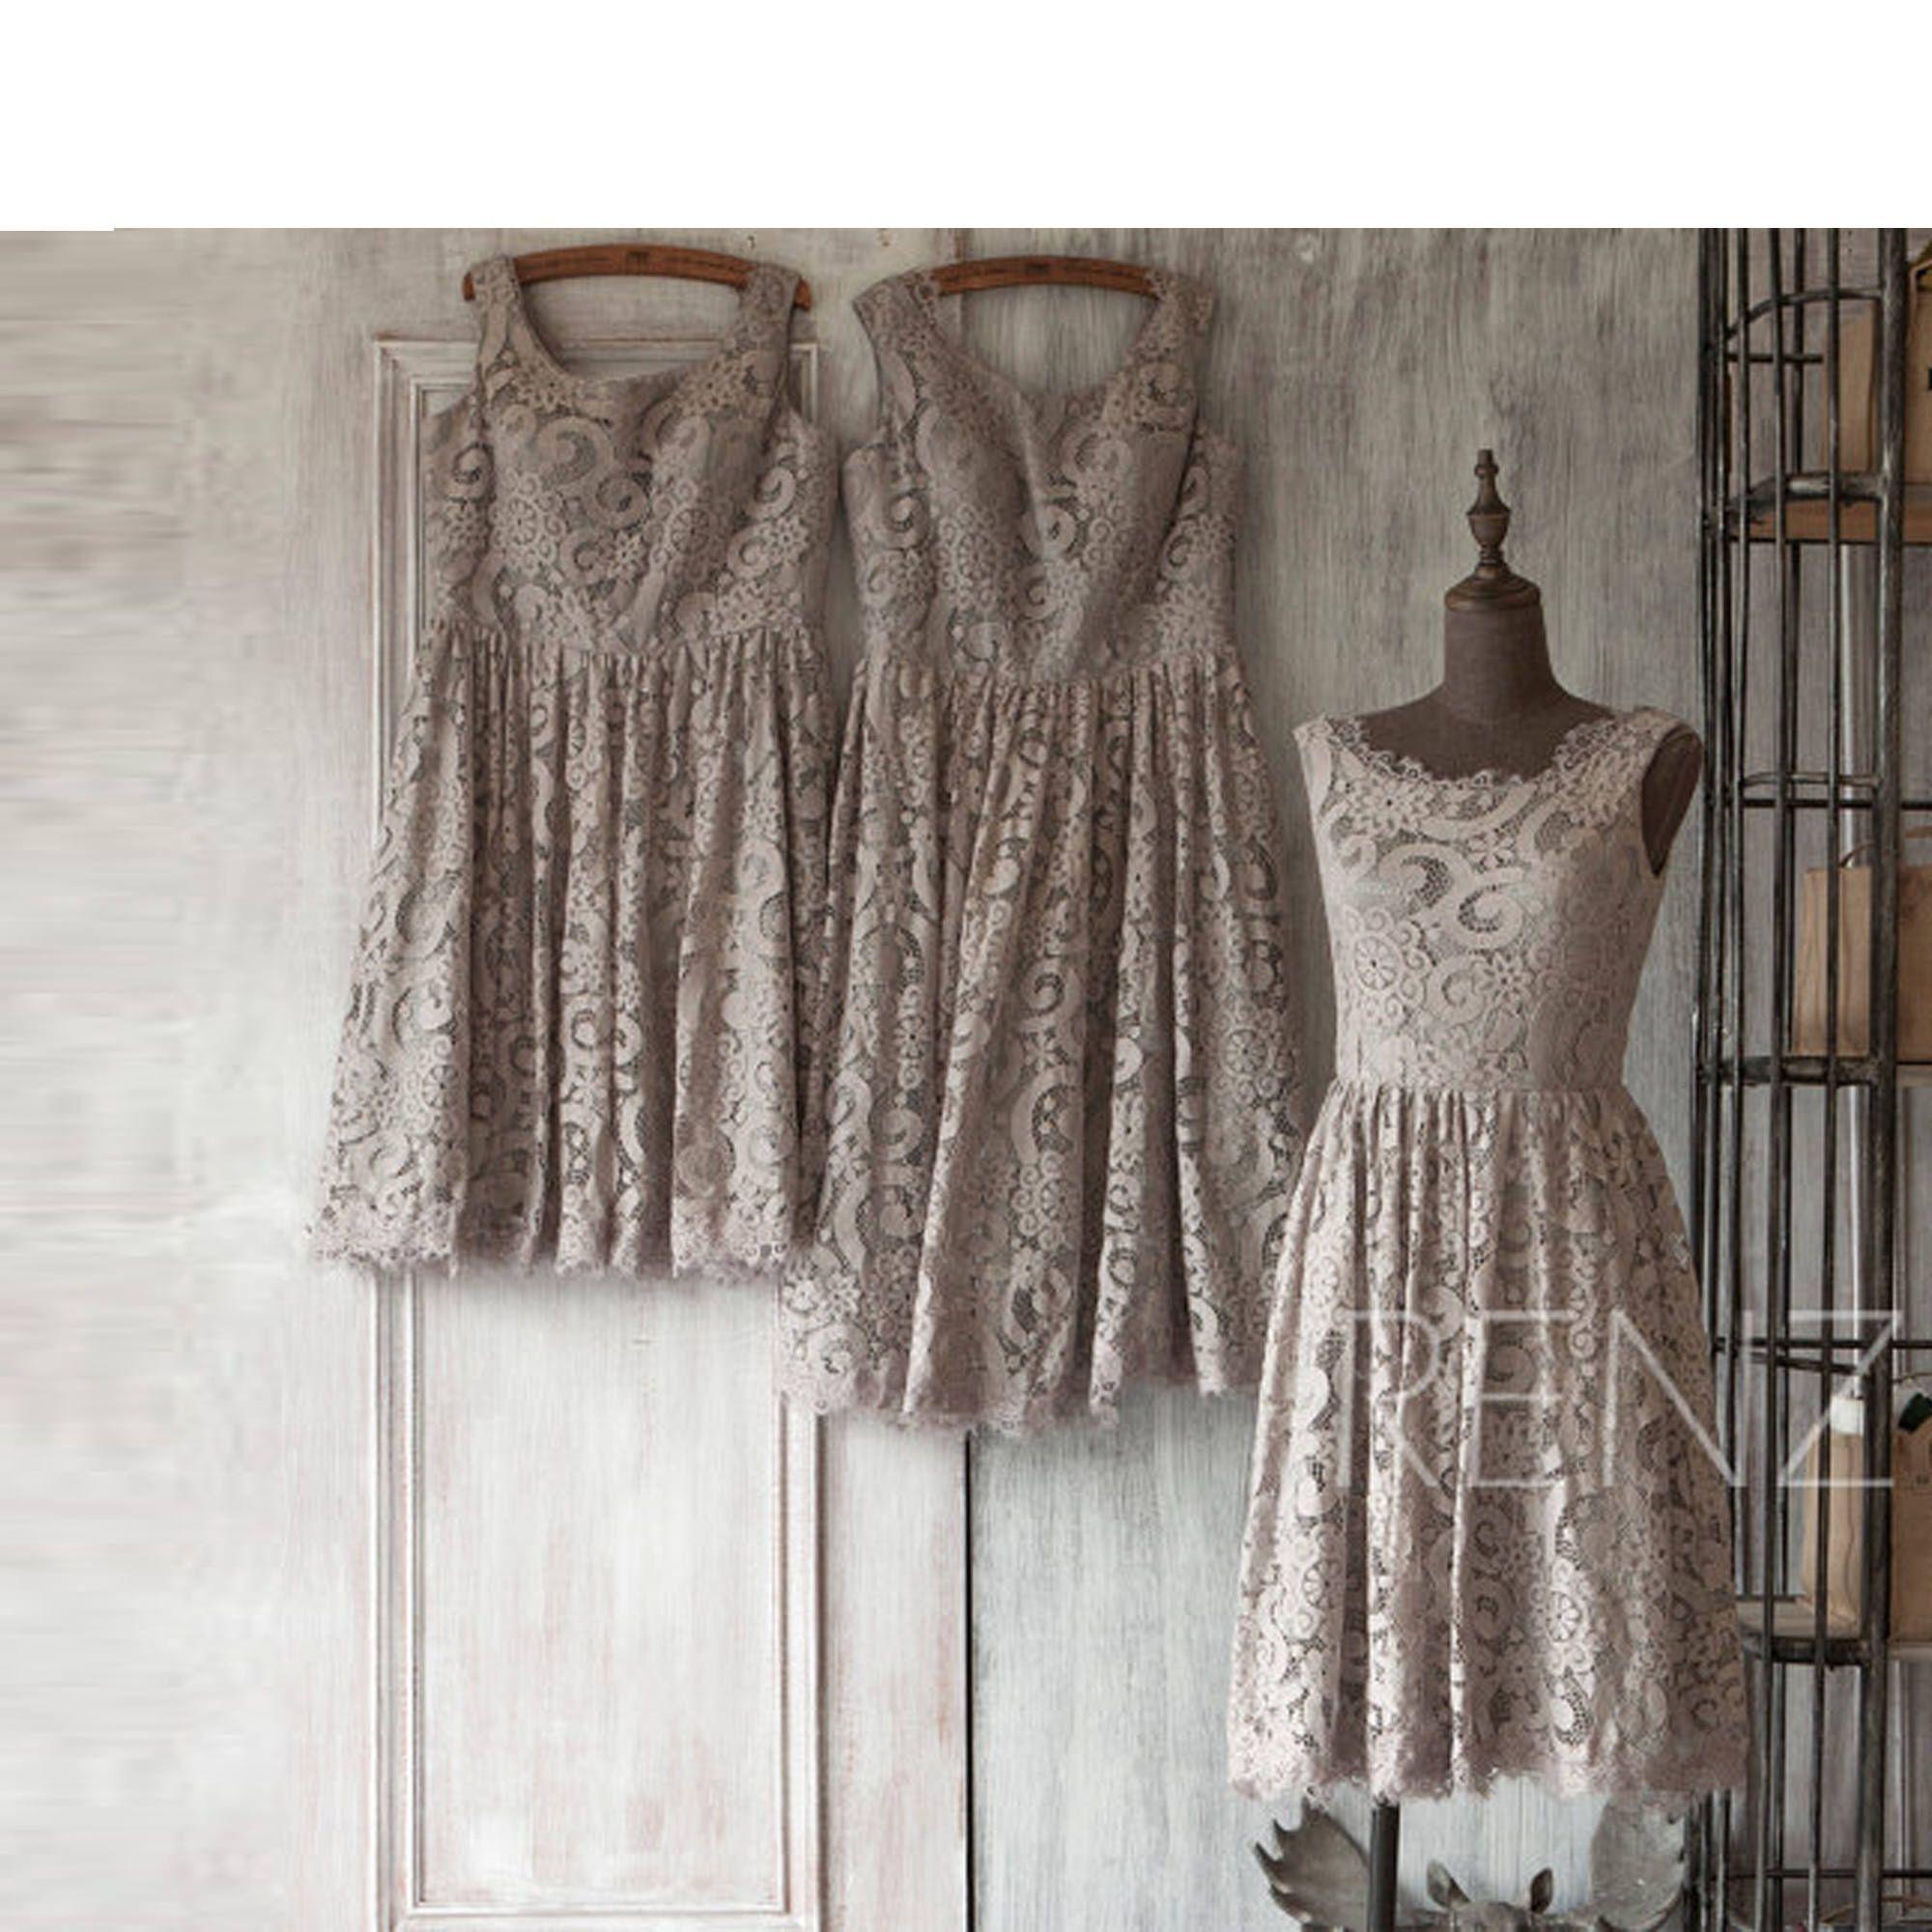 Bridesmaid dress gray lace dresswedding dressshort party dressa